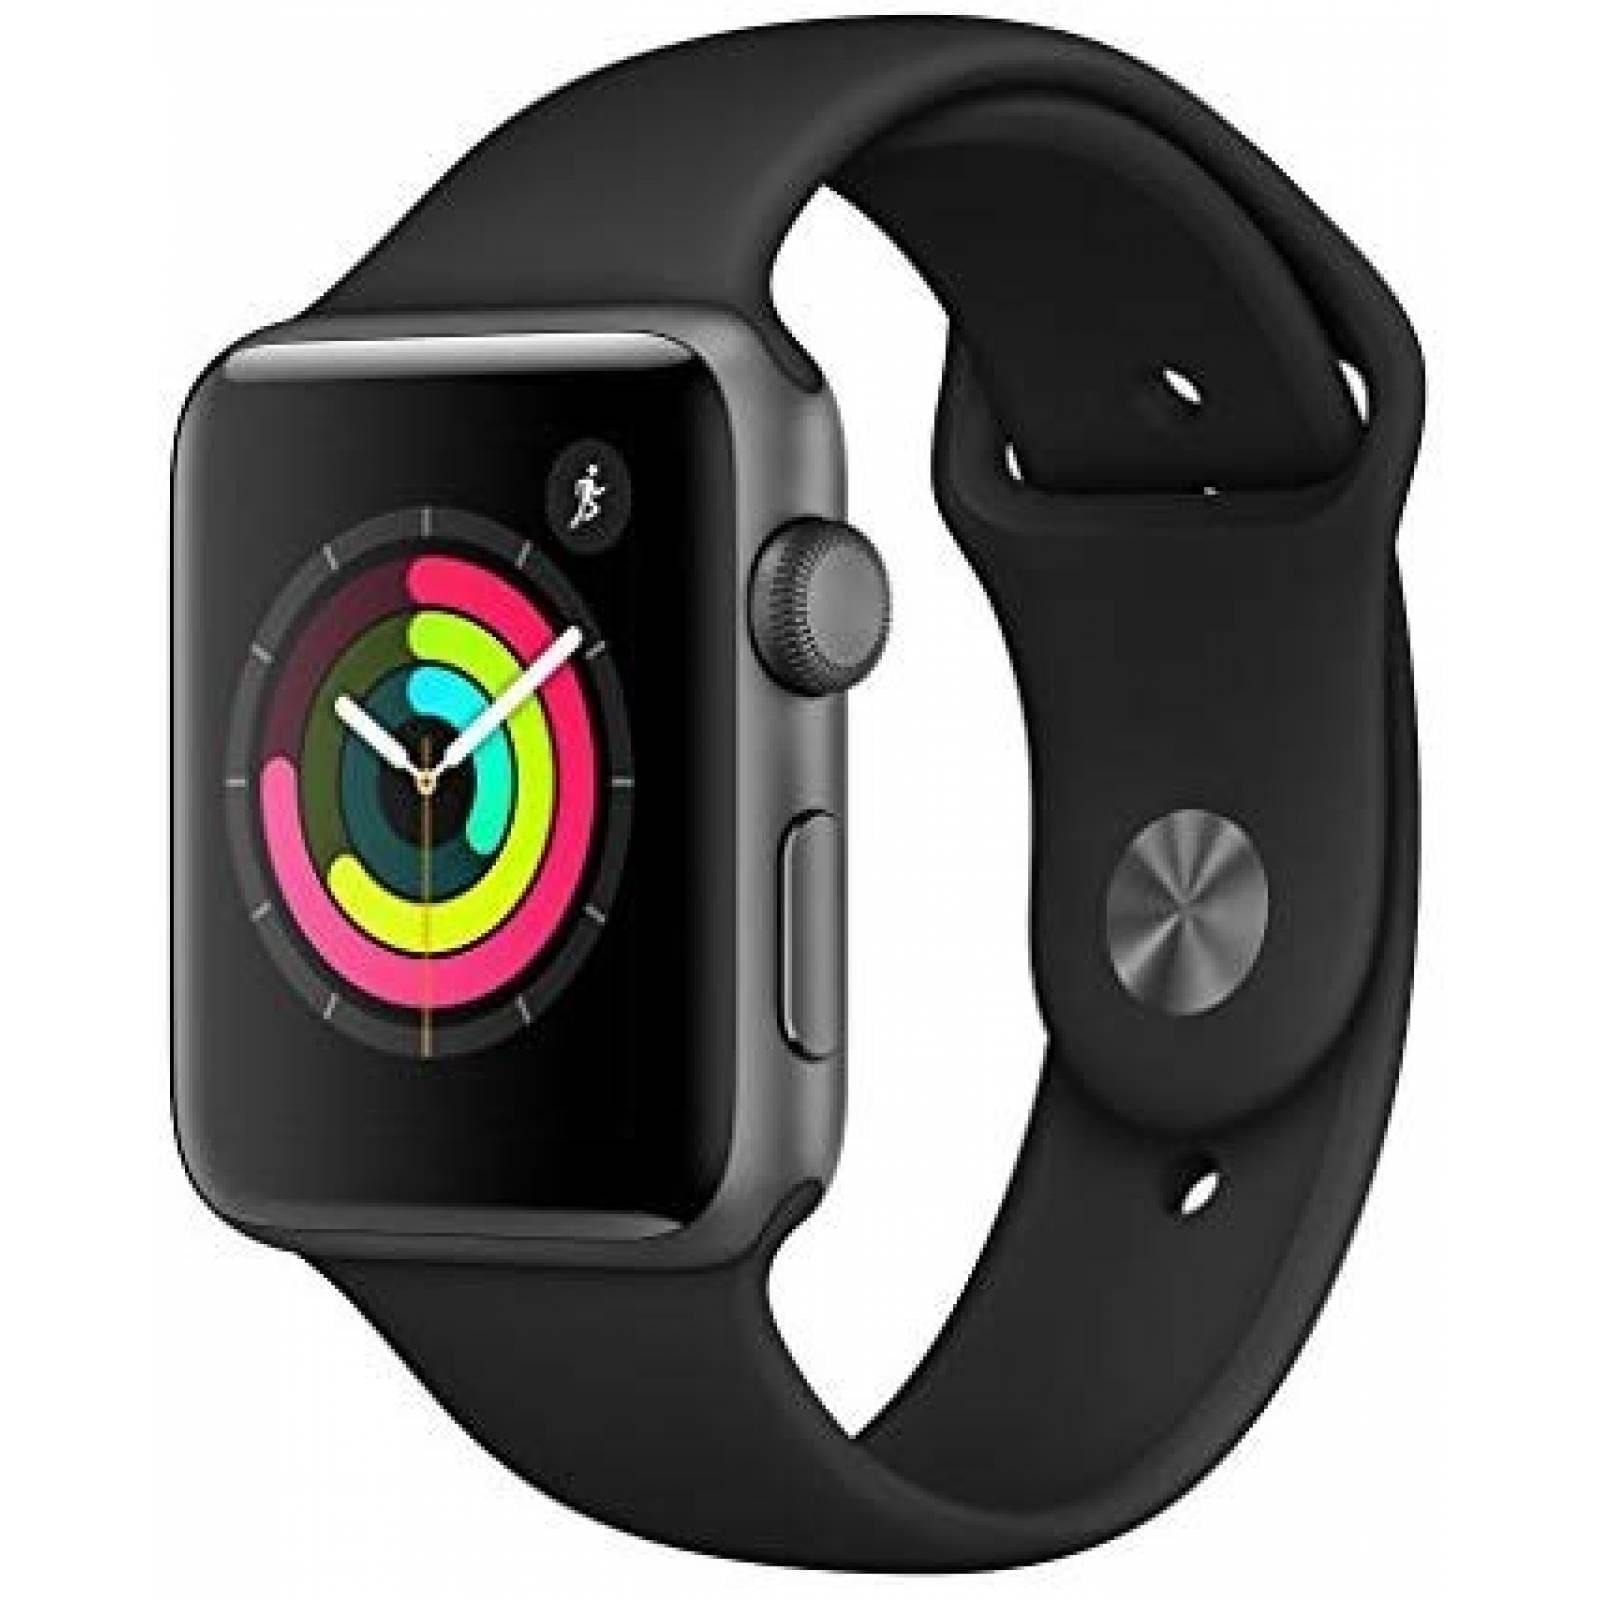 Smartwatch Apple Series 3 42mm GPS Correa Deportiva -Negro